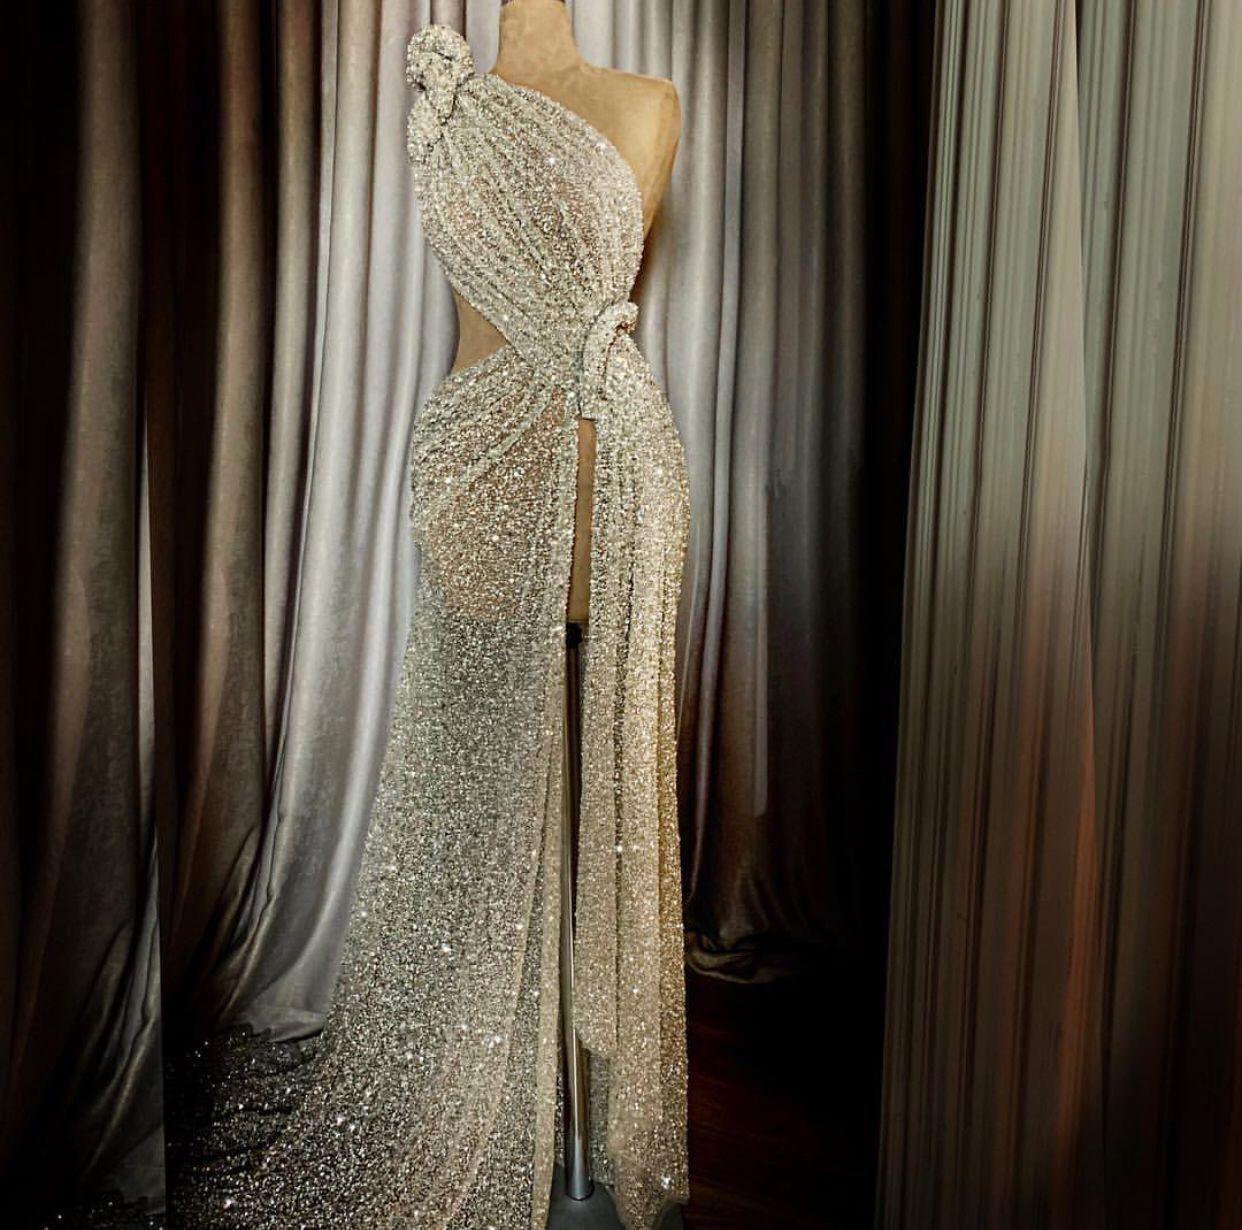 2168da059c404 Red carpet dress by Lena Berisha | Haute couture en 2019 | Robe ...